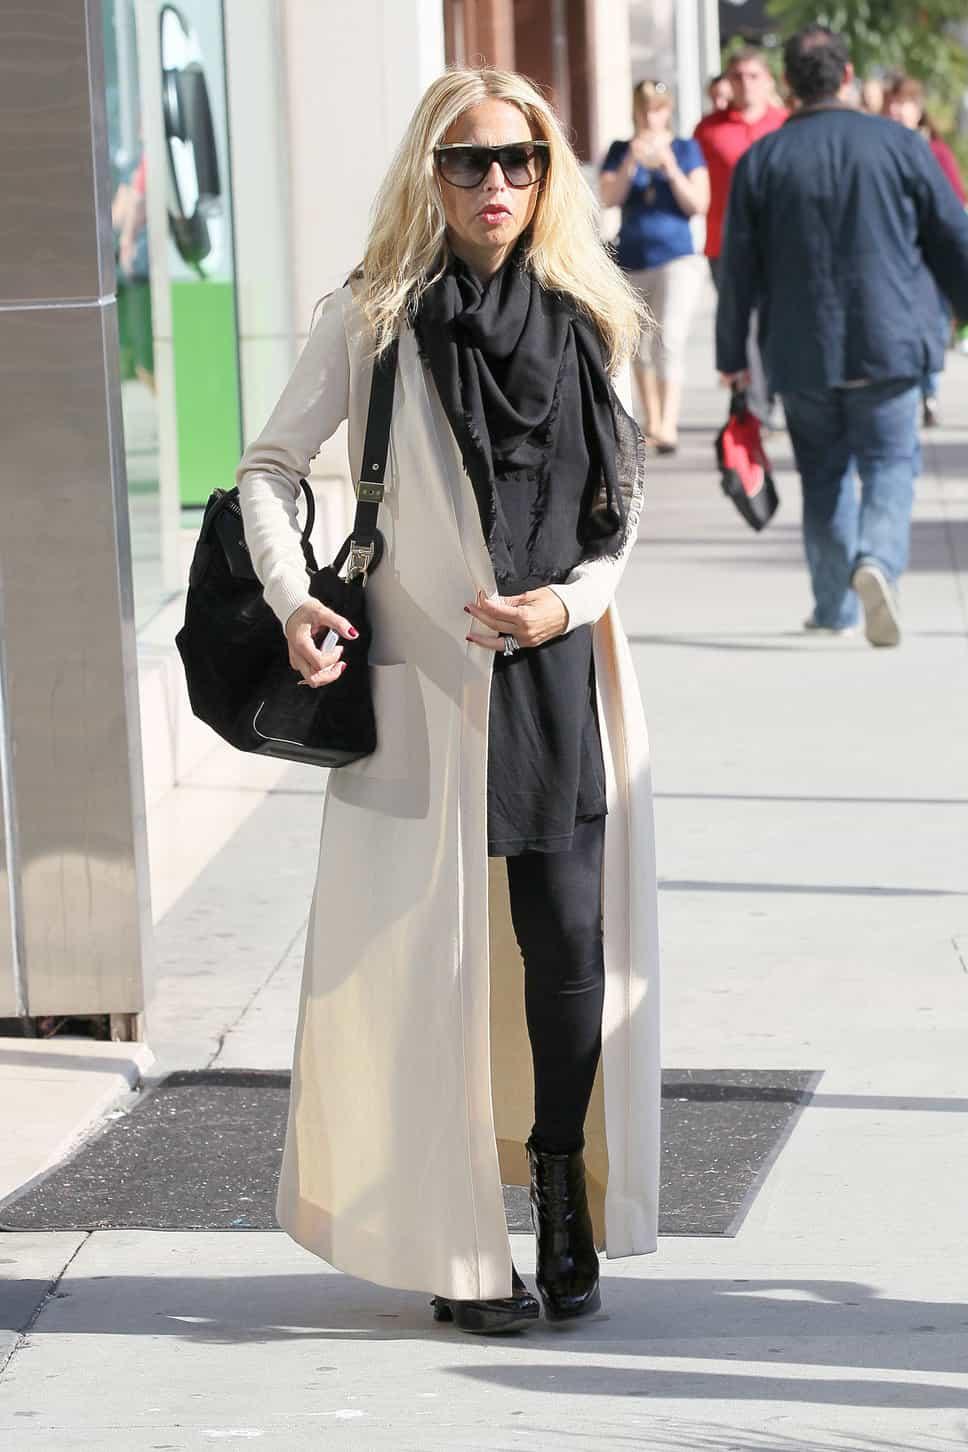 2014 Autumn Trend LONG Cardigans | Fashion Tag Blog